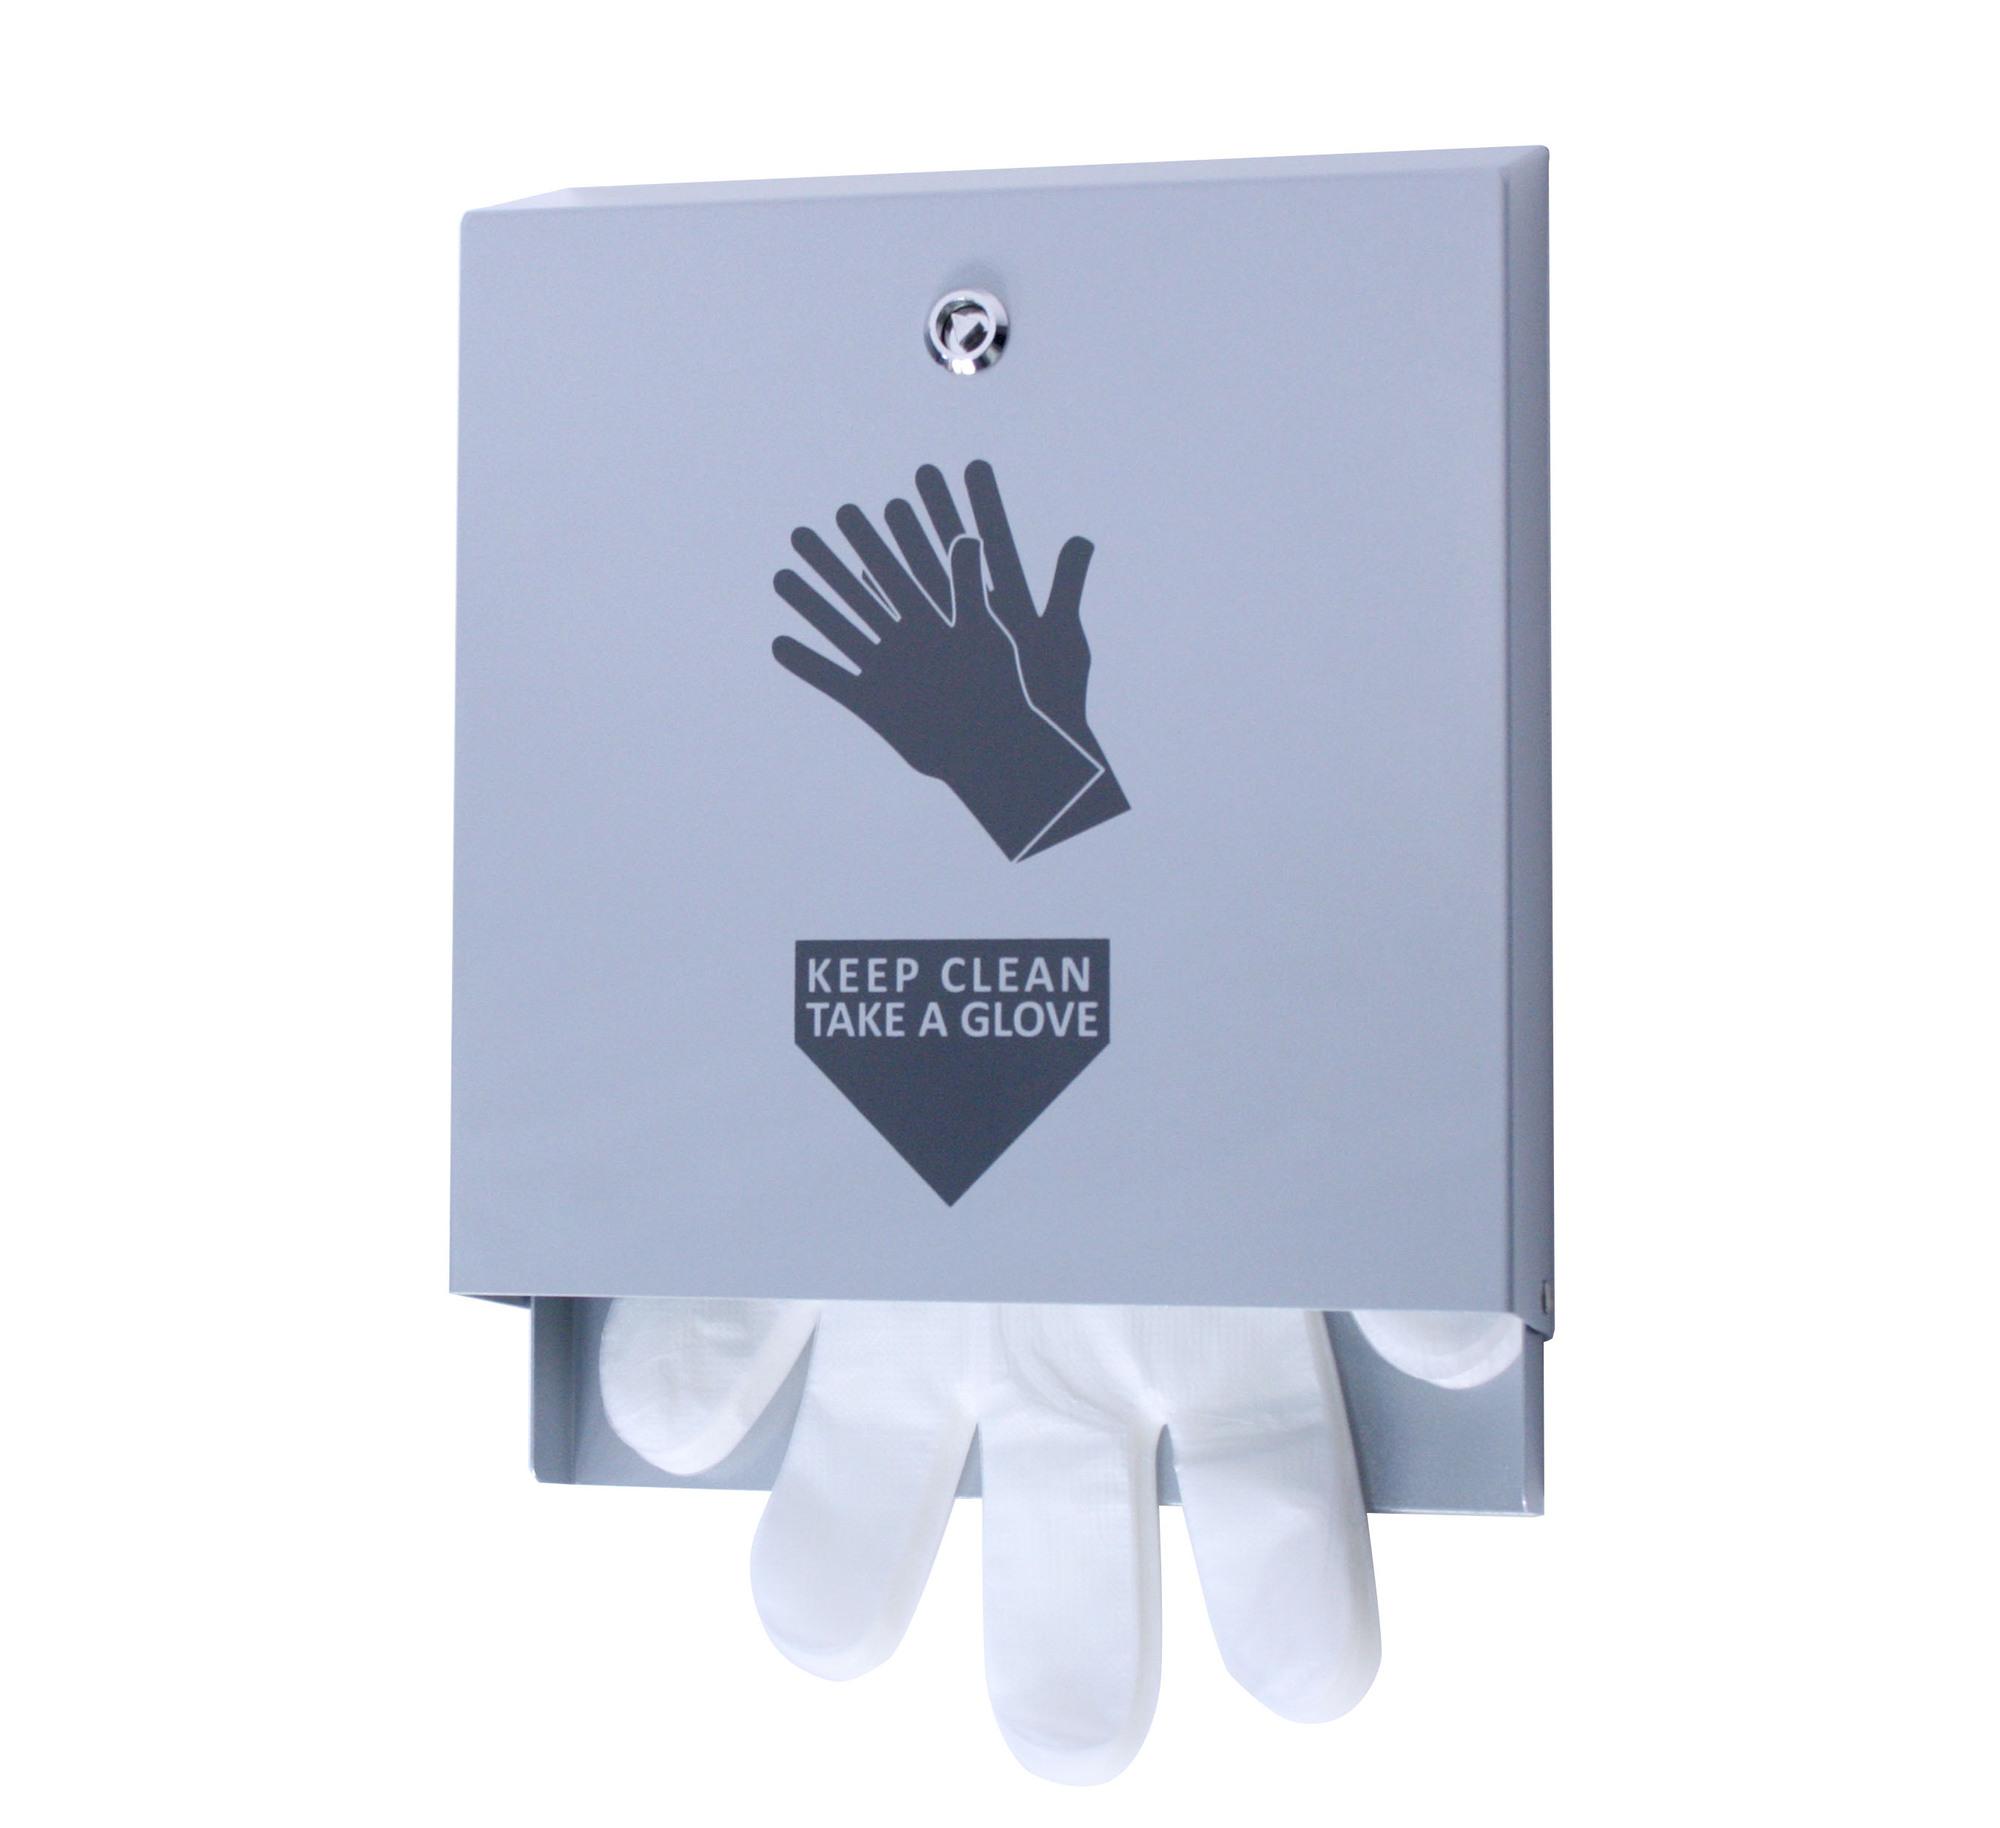 QEC - Glove Dispenser with Bonus 500 Free Gloves